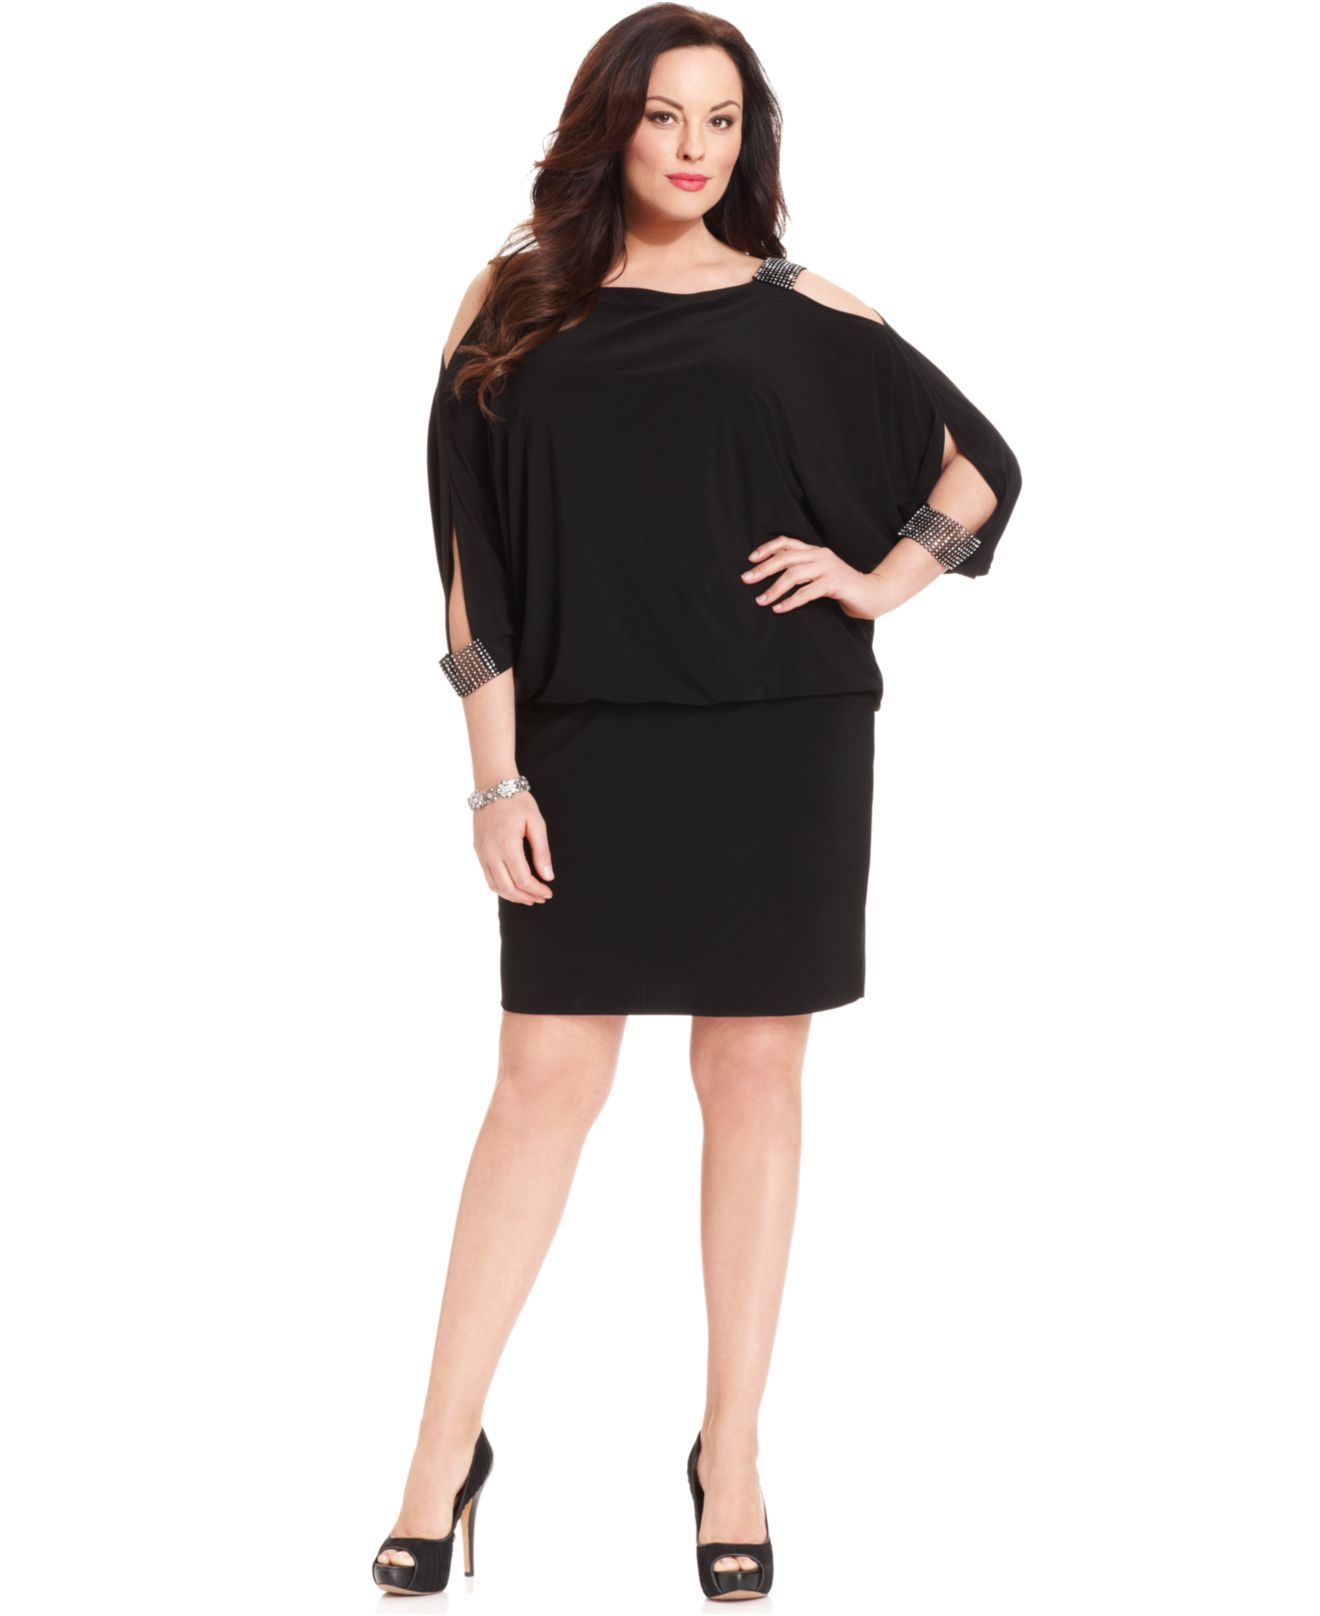 Black sleeved dress plus sizes